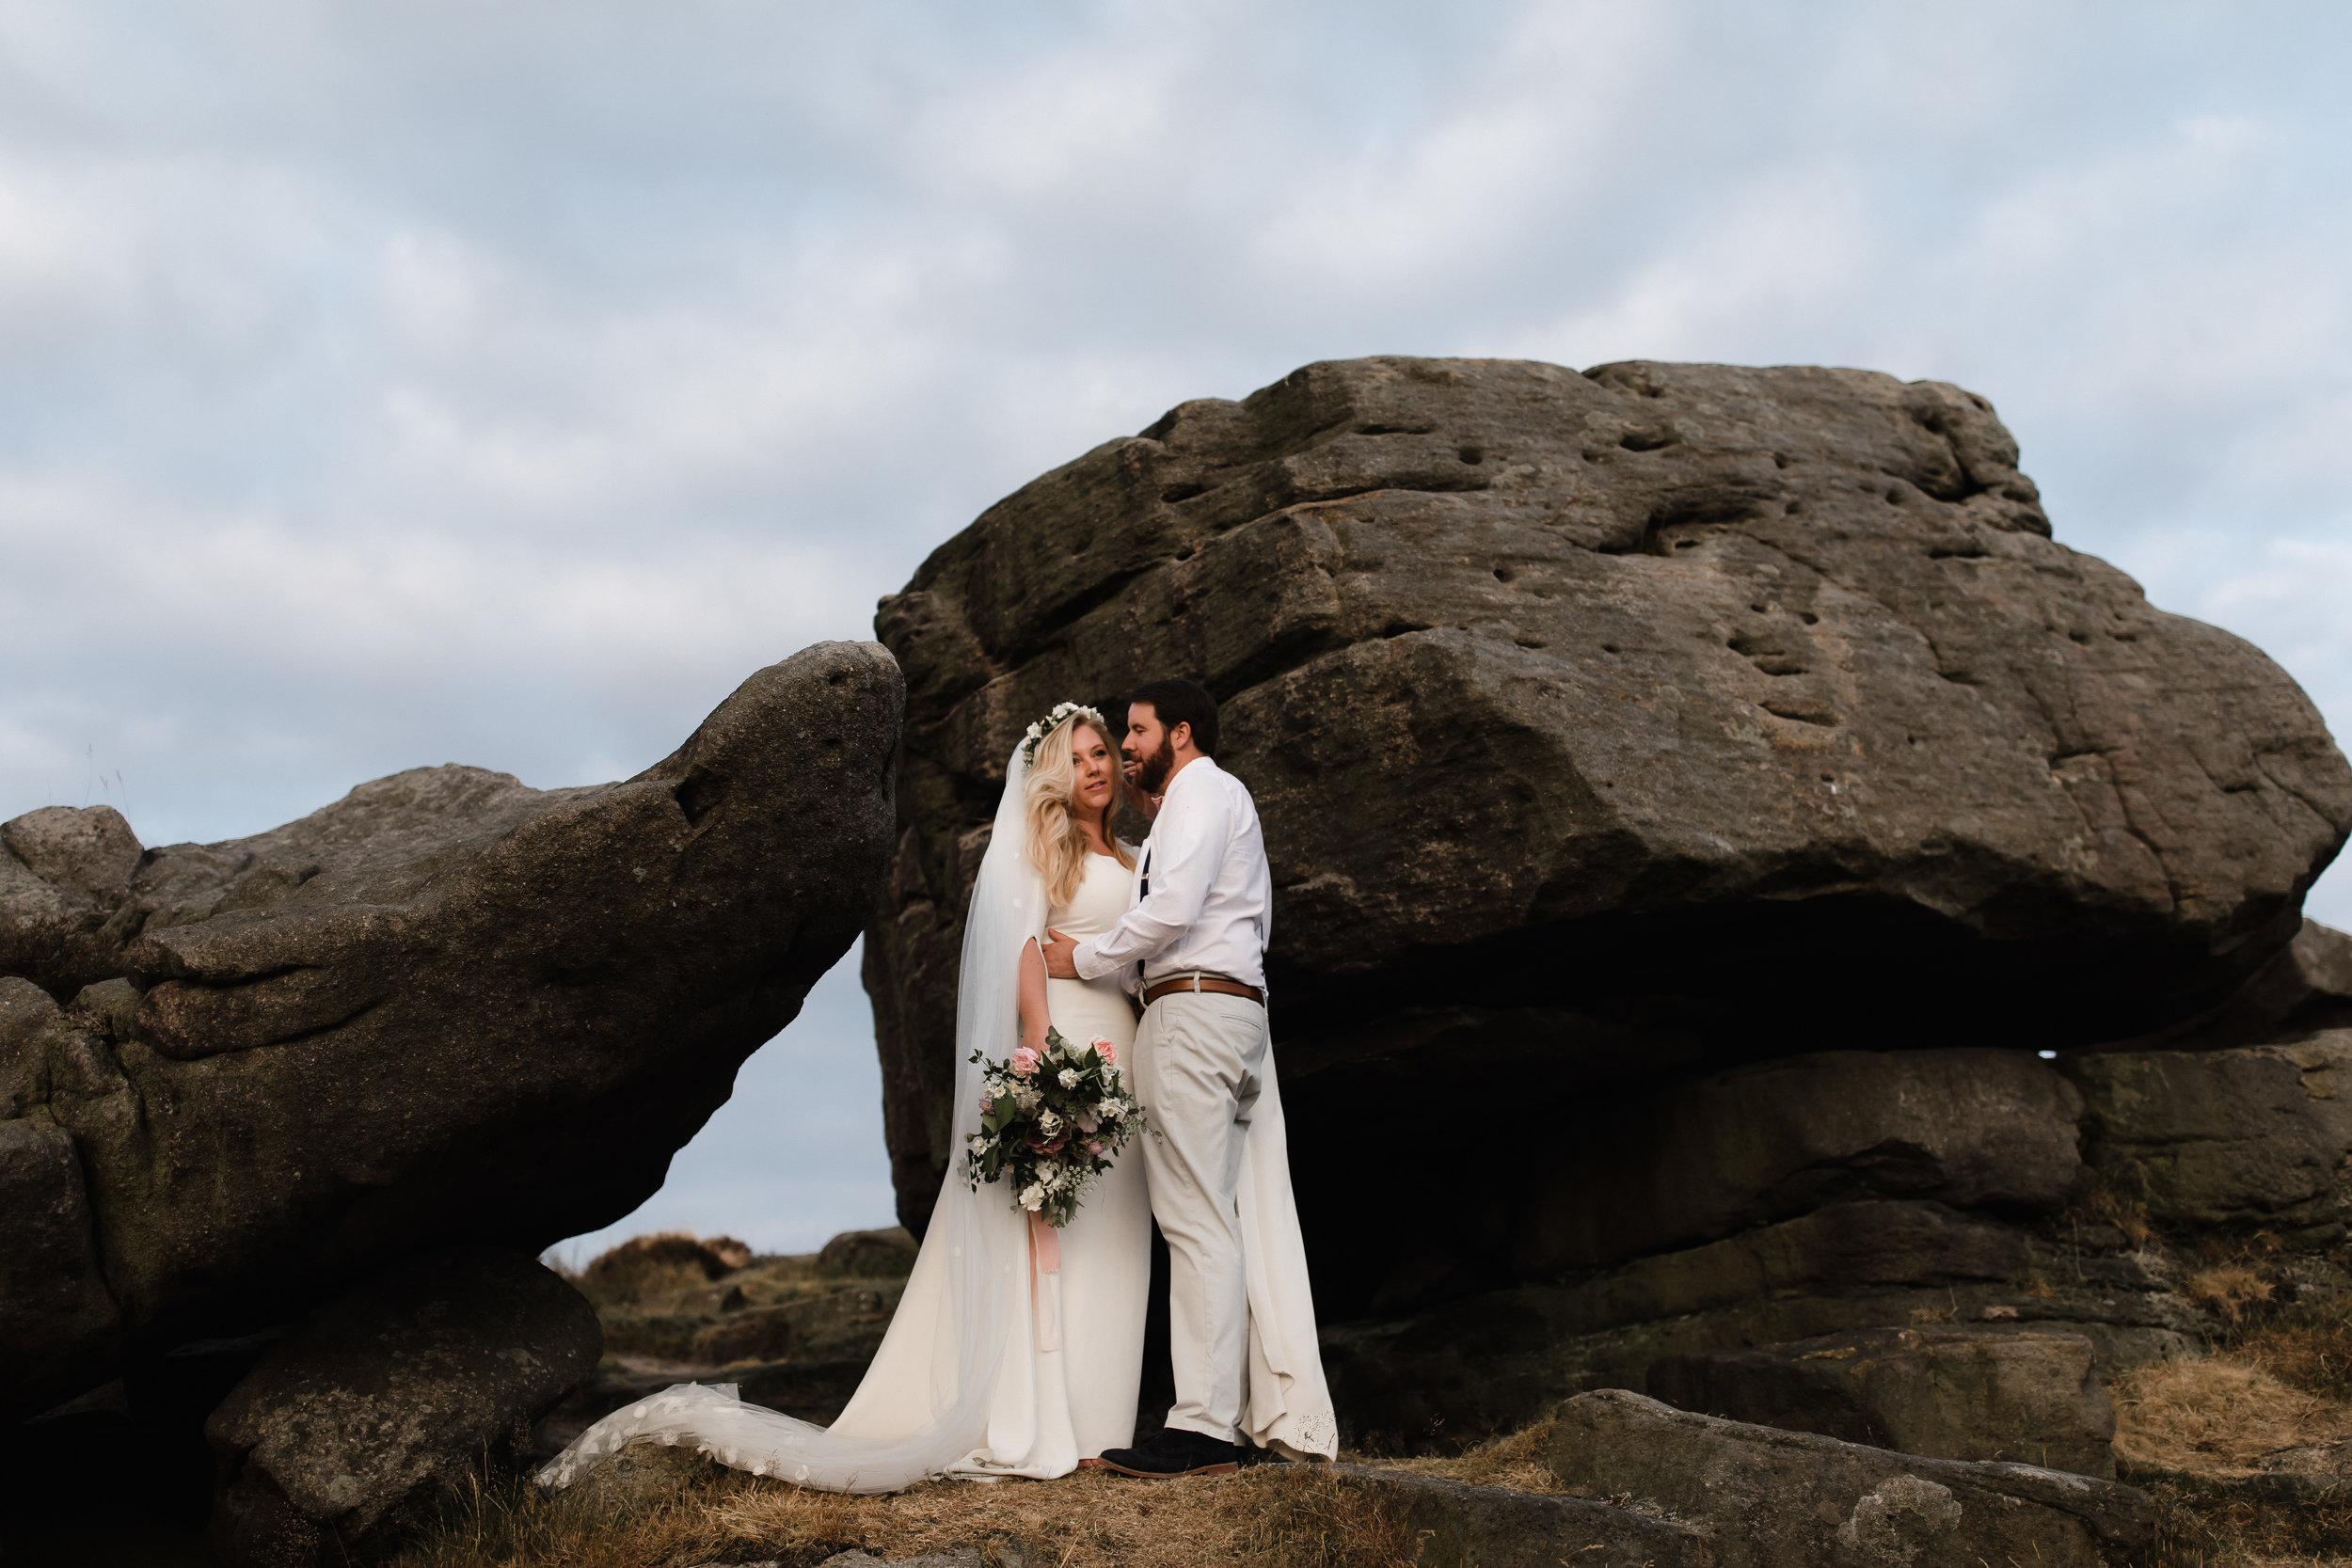 Lauren-Peak-District-Bespoke-Wedding-Gown-Petal-Veil-Train-Long-Sleeve-Susanna-Greening-Designs-Matlock-Derbyshire-23